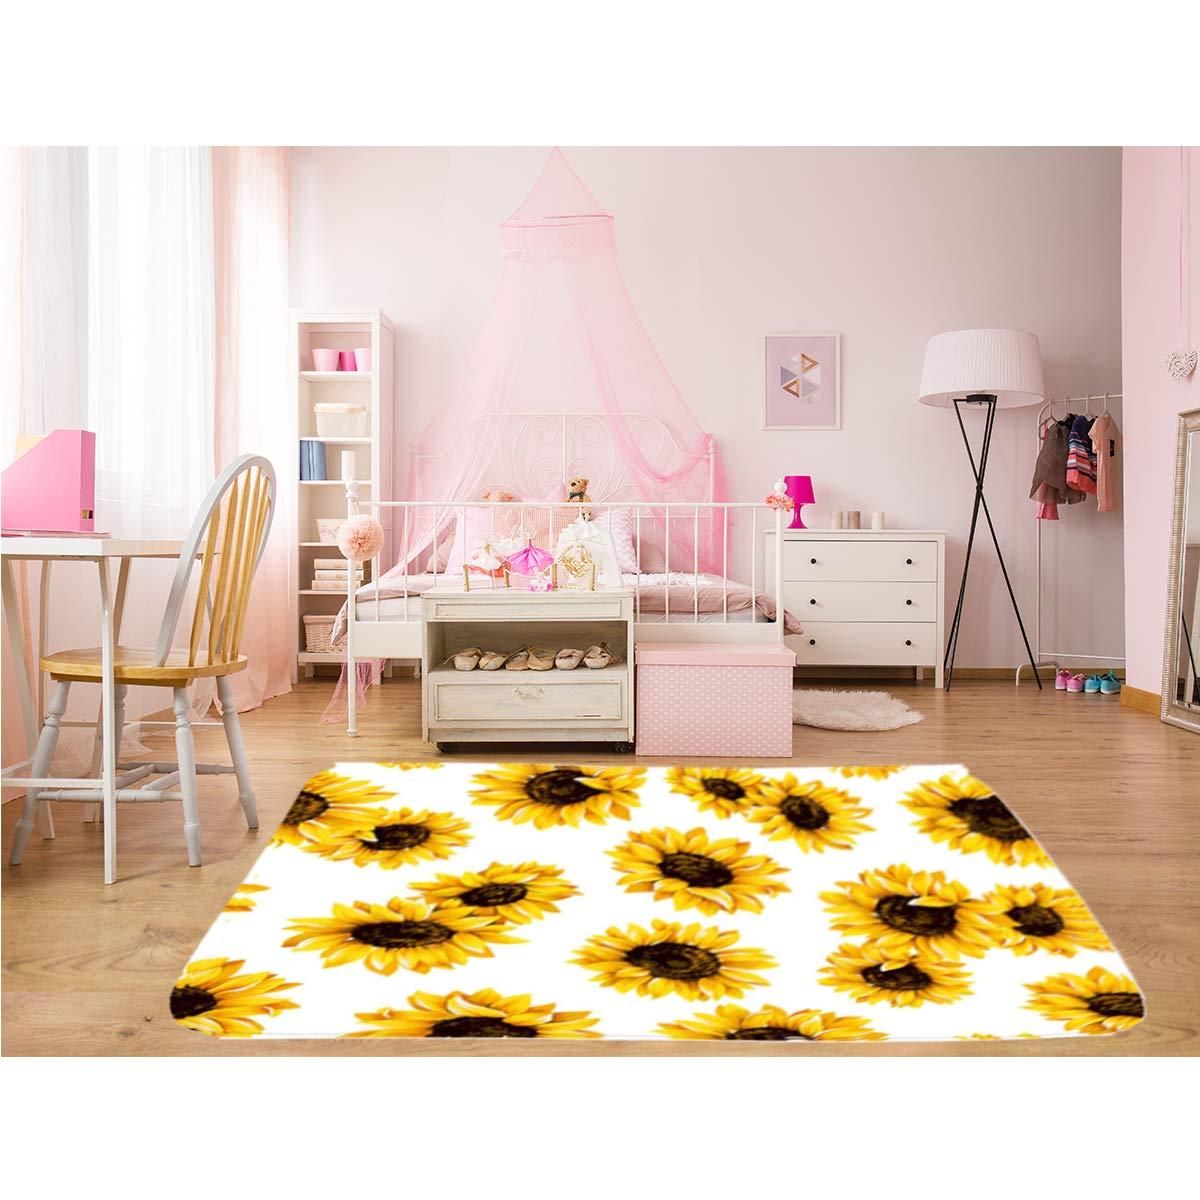 Baseball Pattern Area Rug for Living Room Bedroom 5x7 QH